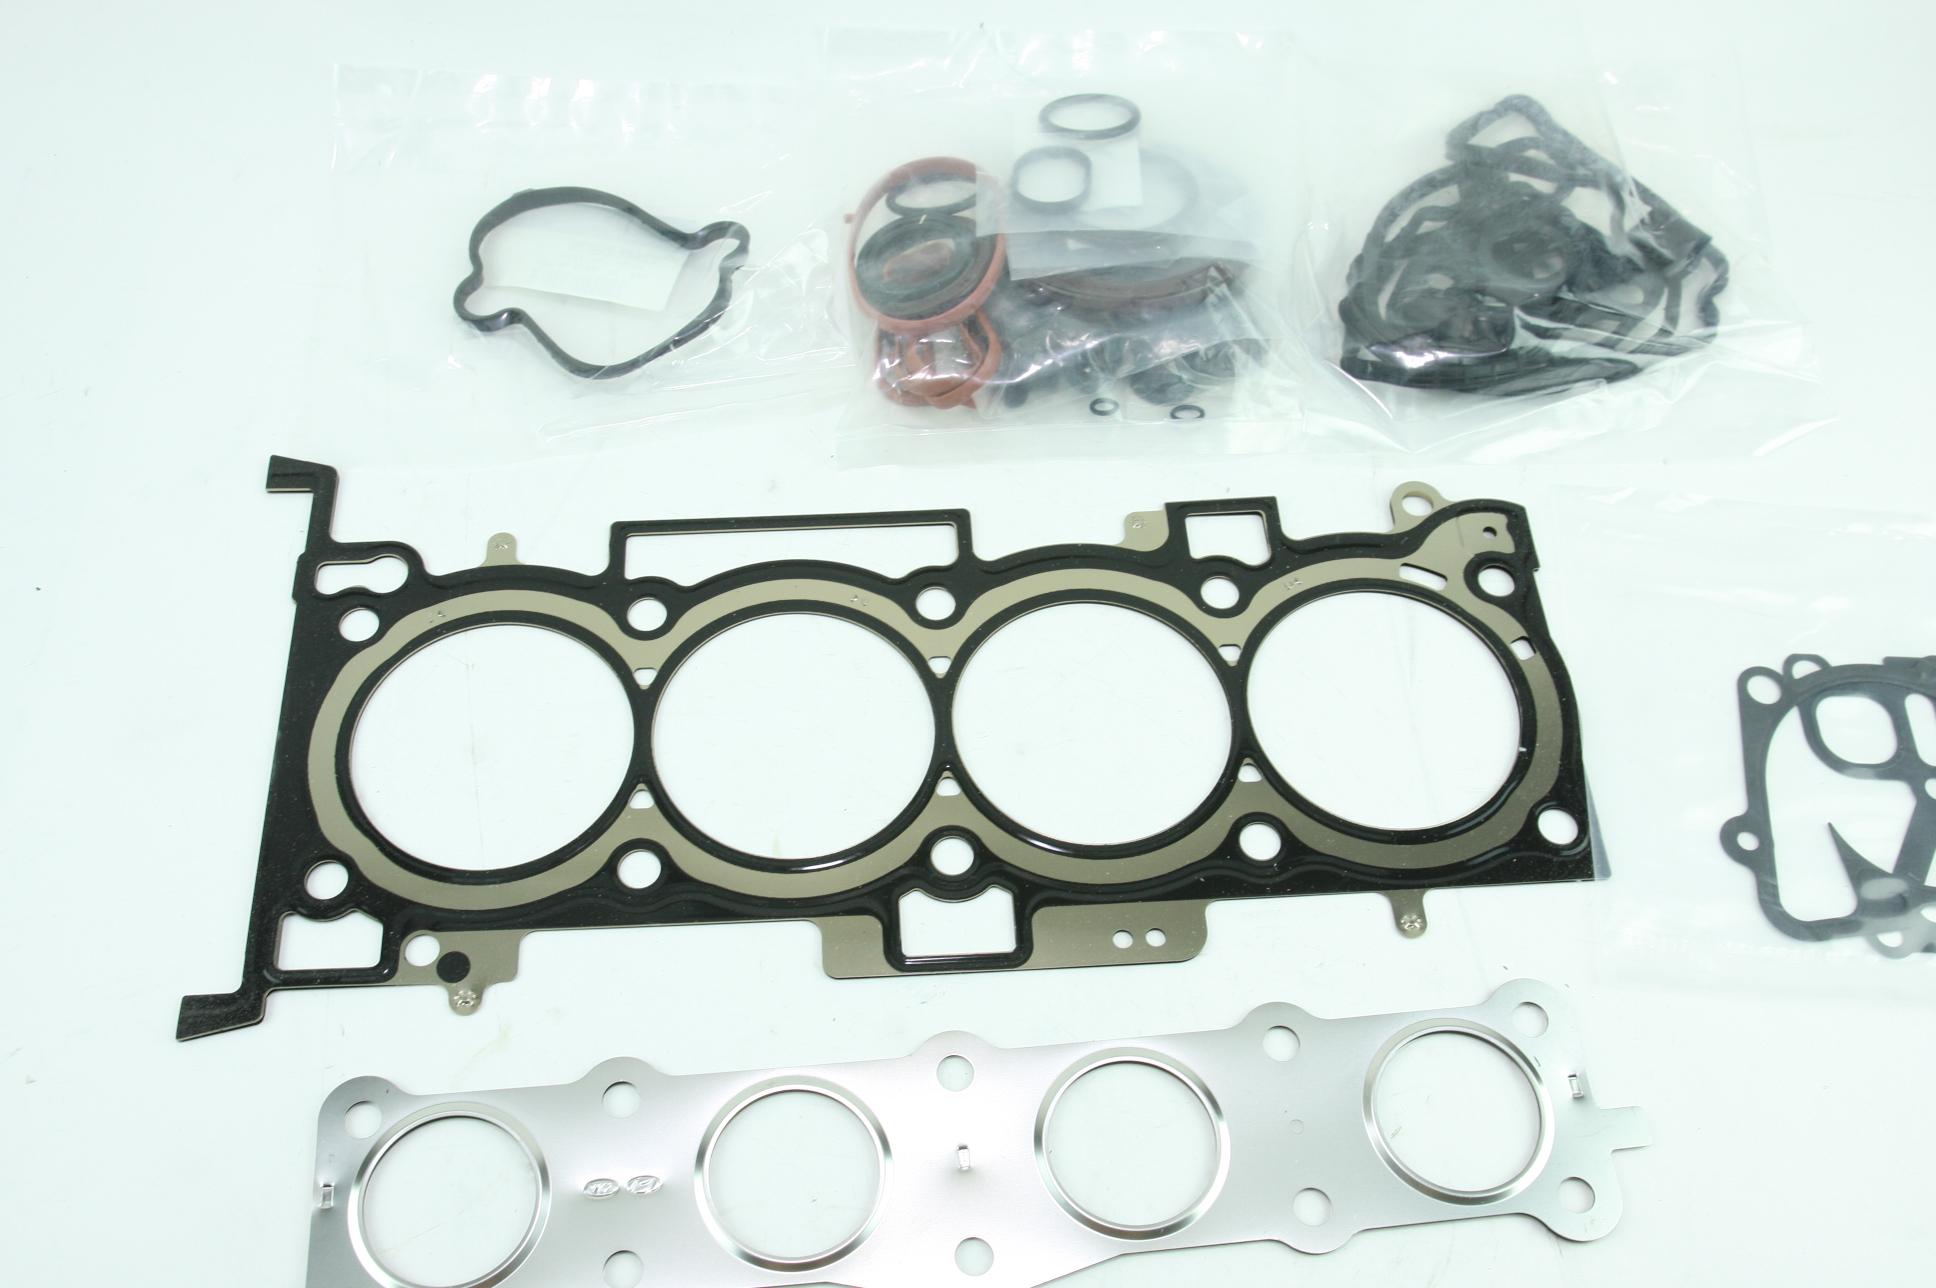 ** New Genuine Hyundai 209102GK03 Full Engine Overhaul Gasket Set Free Shipping - image 7